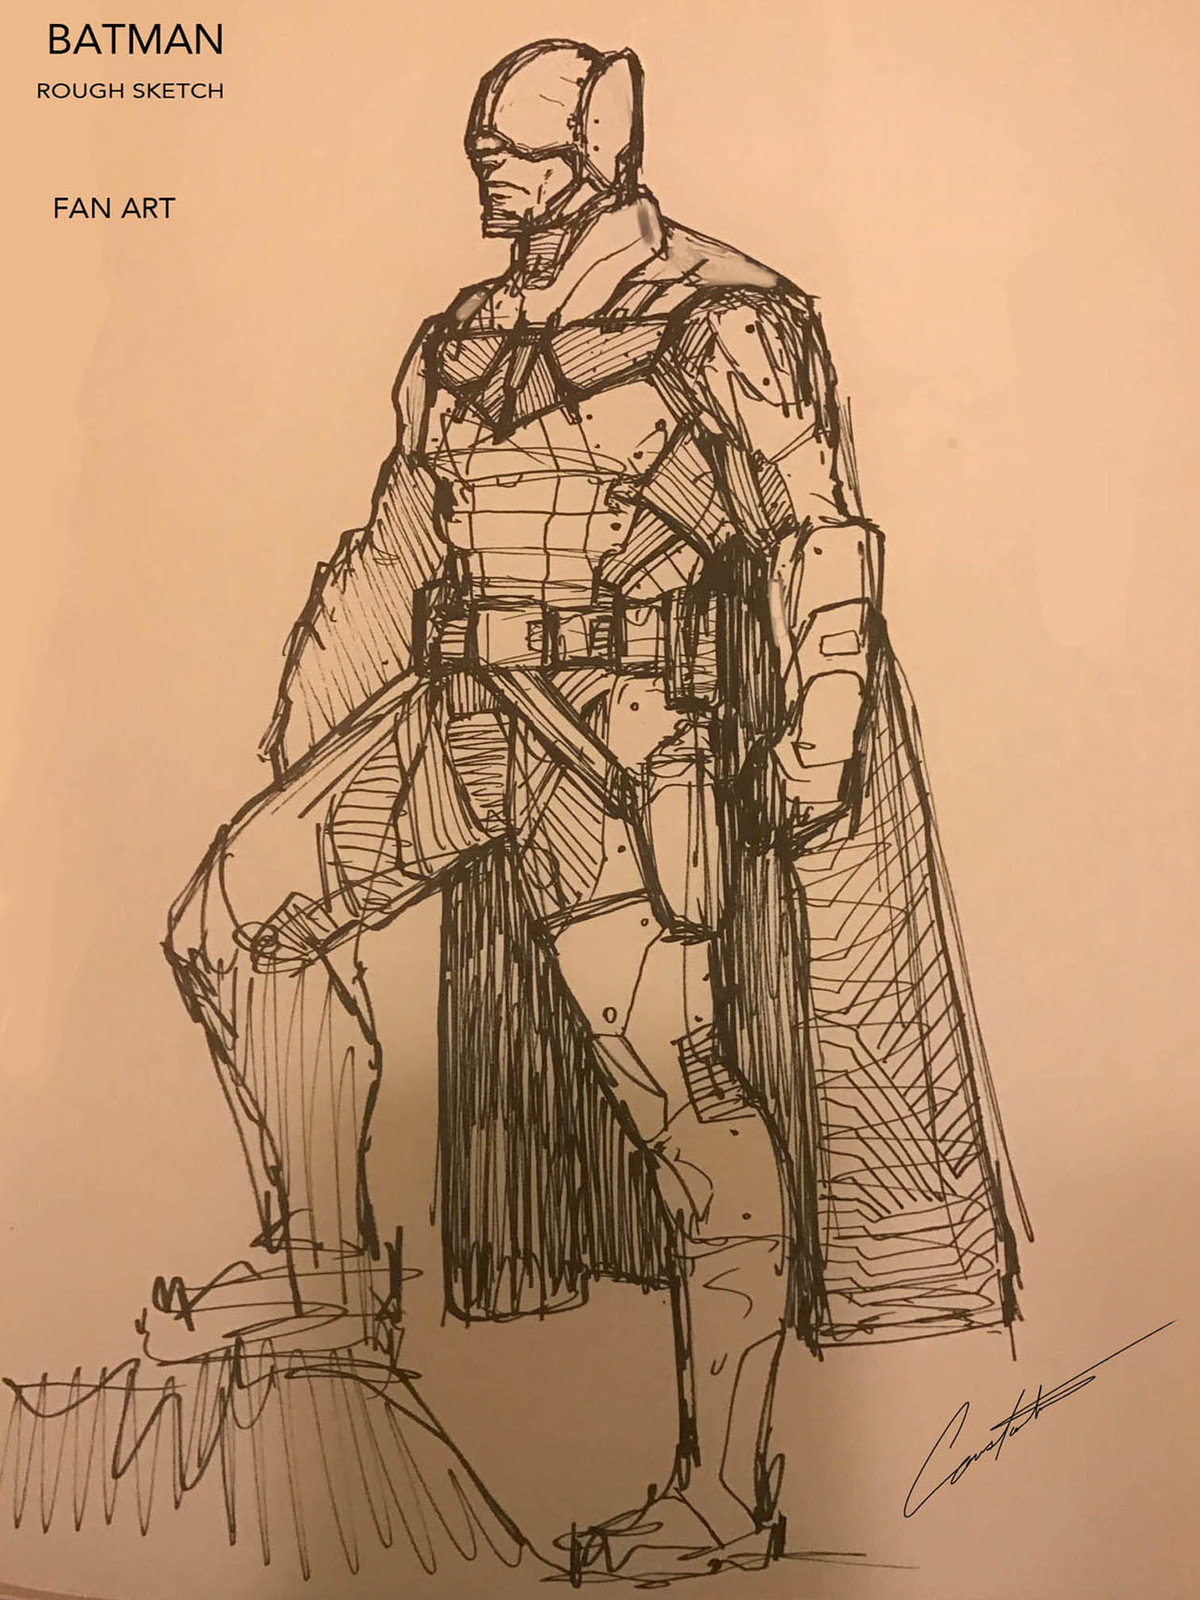 Batman FANART rogh sketch